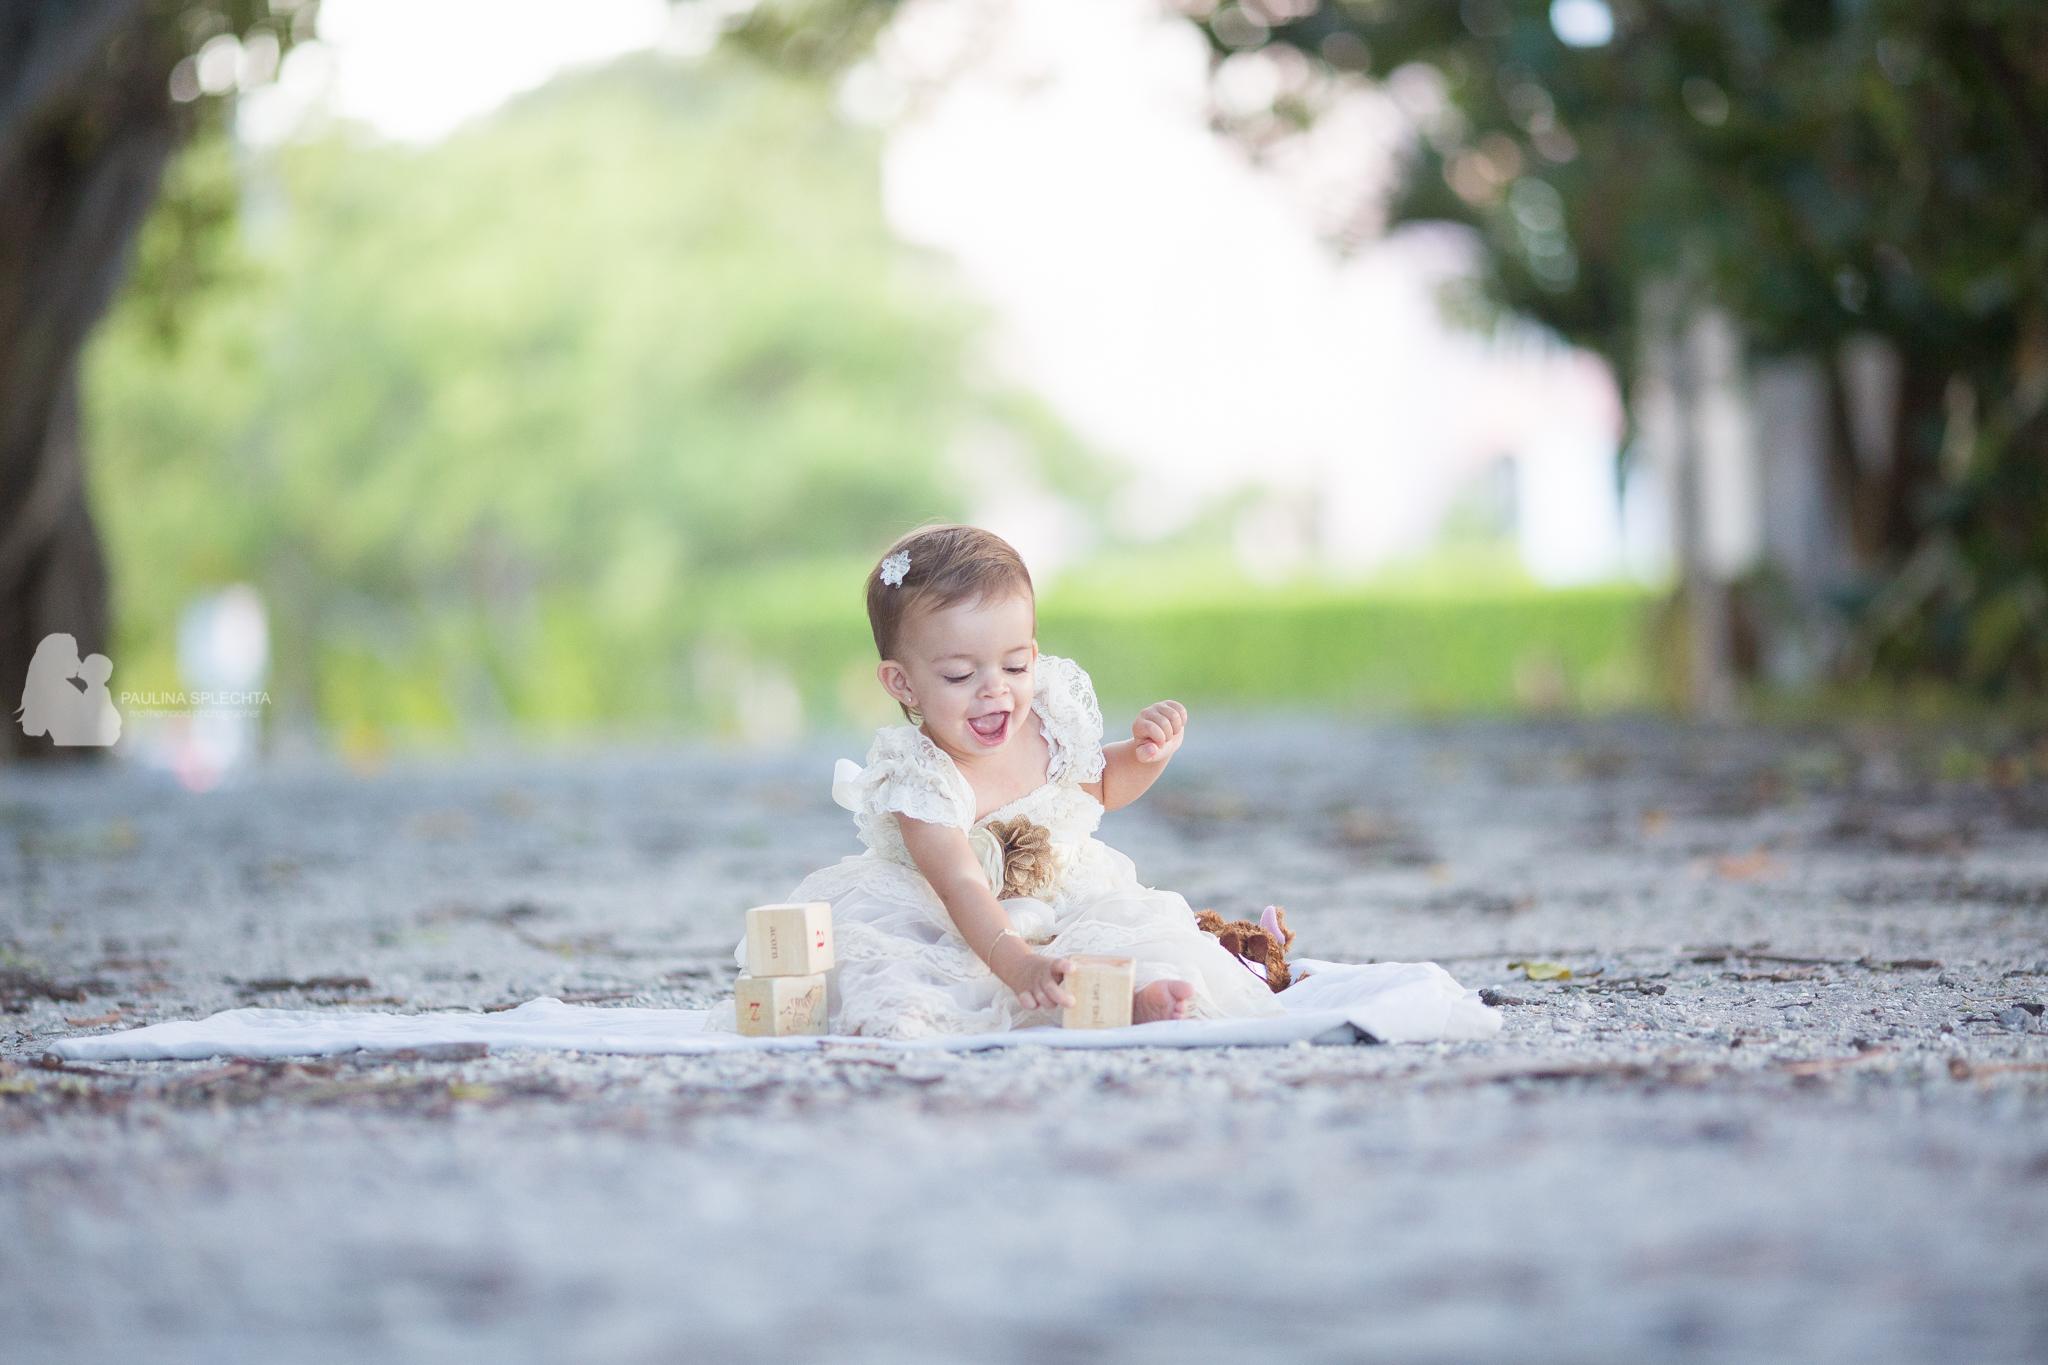 birth-photographer-breastfeeding-family-child-newborn-cake-smash-pregnancy-maternity-15.jpg